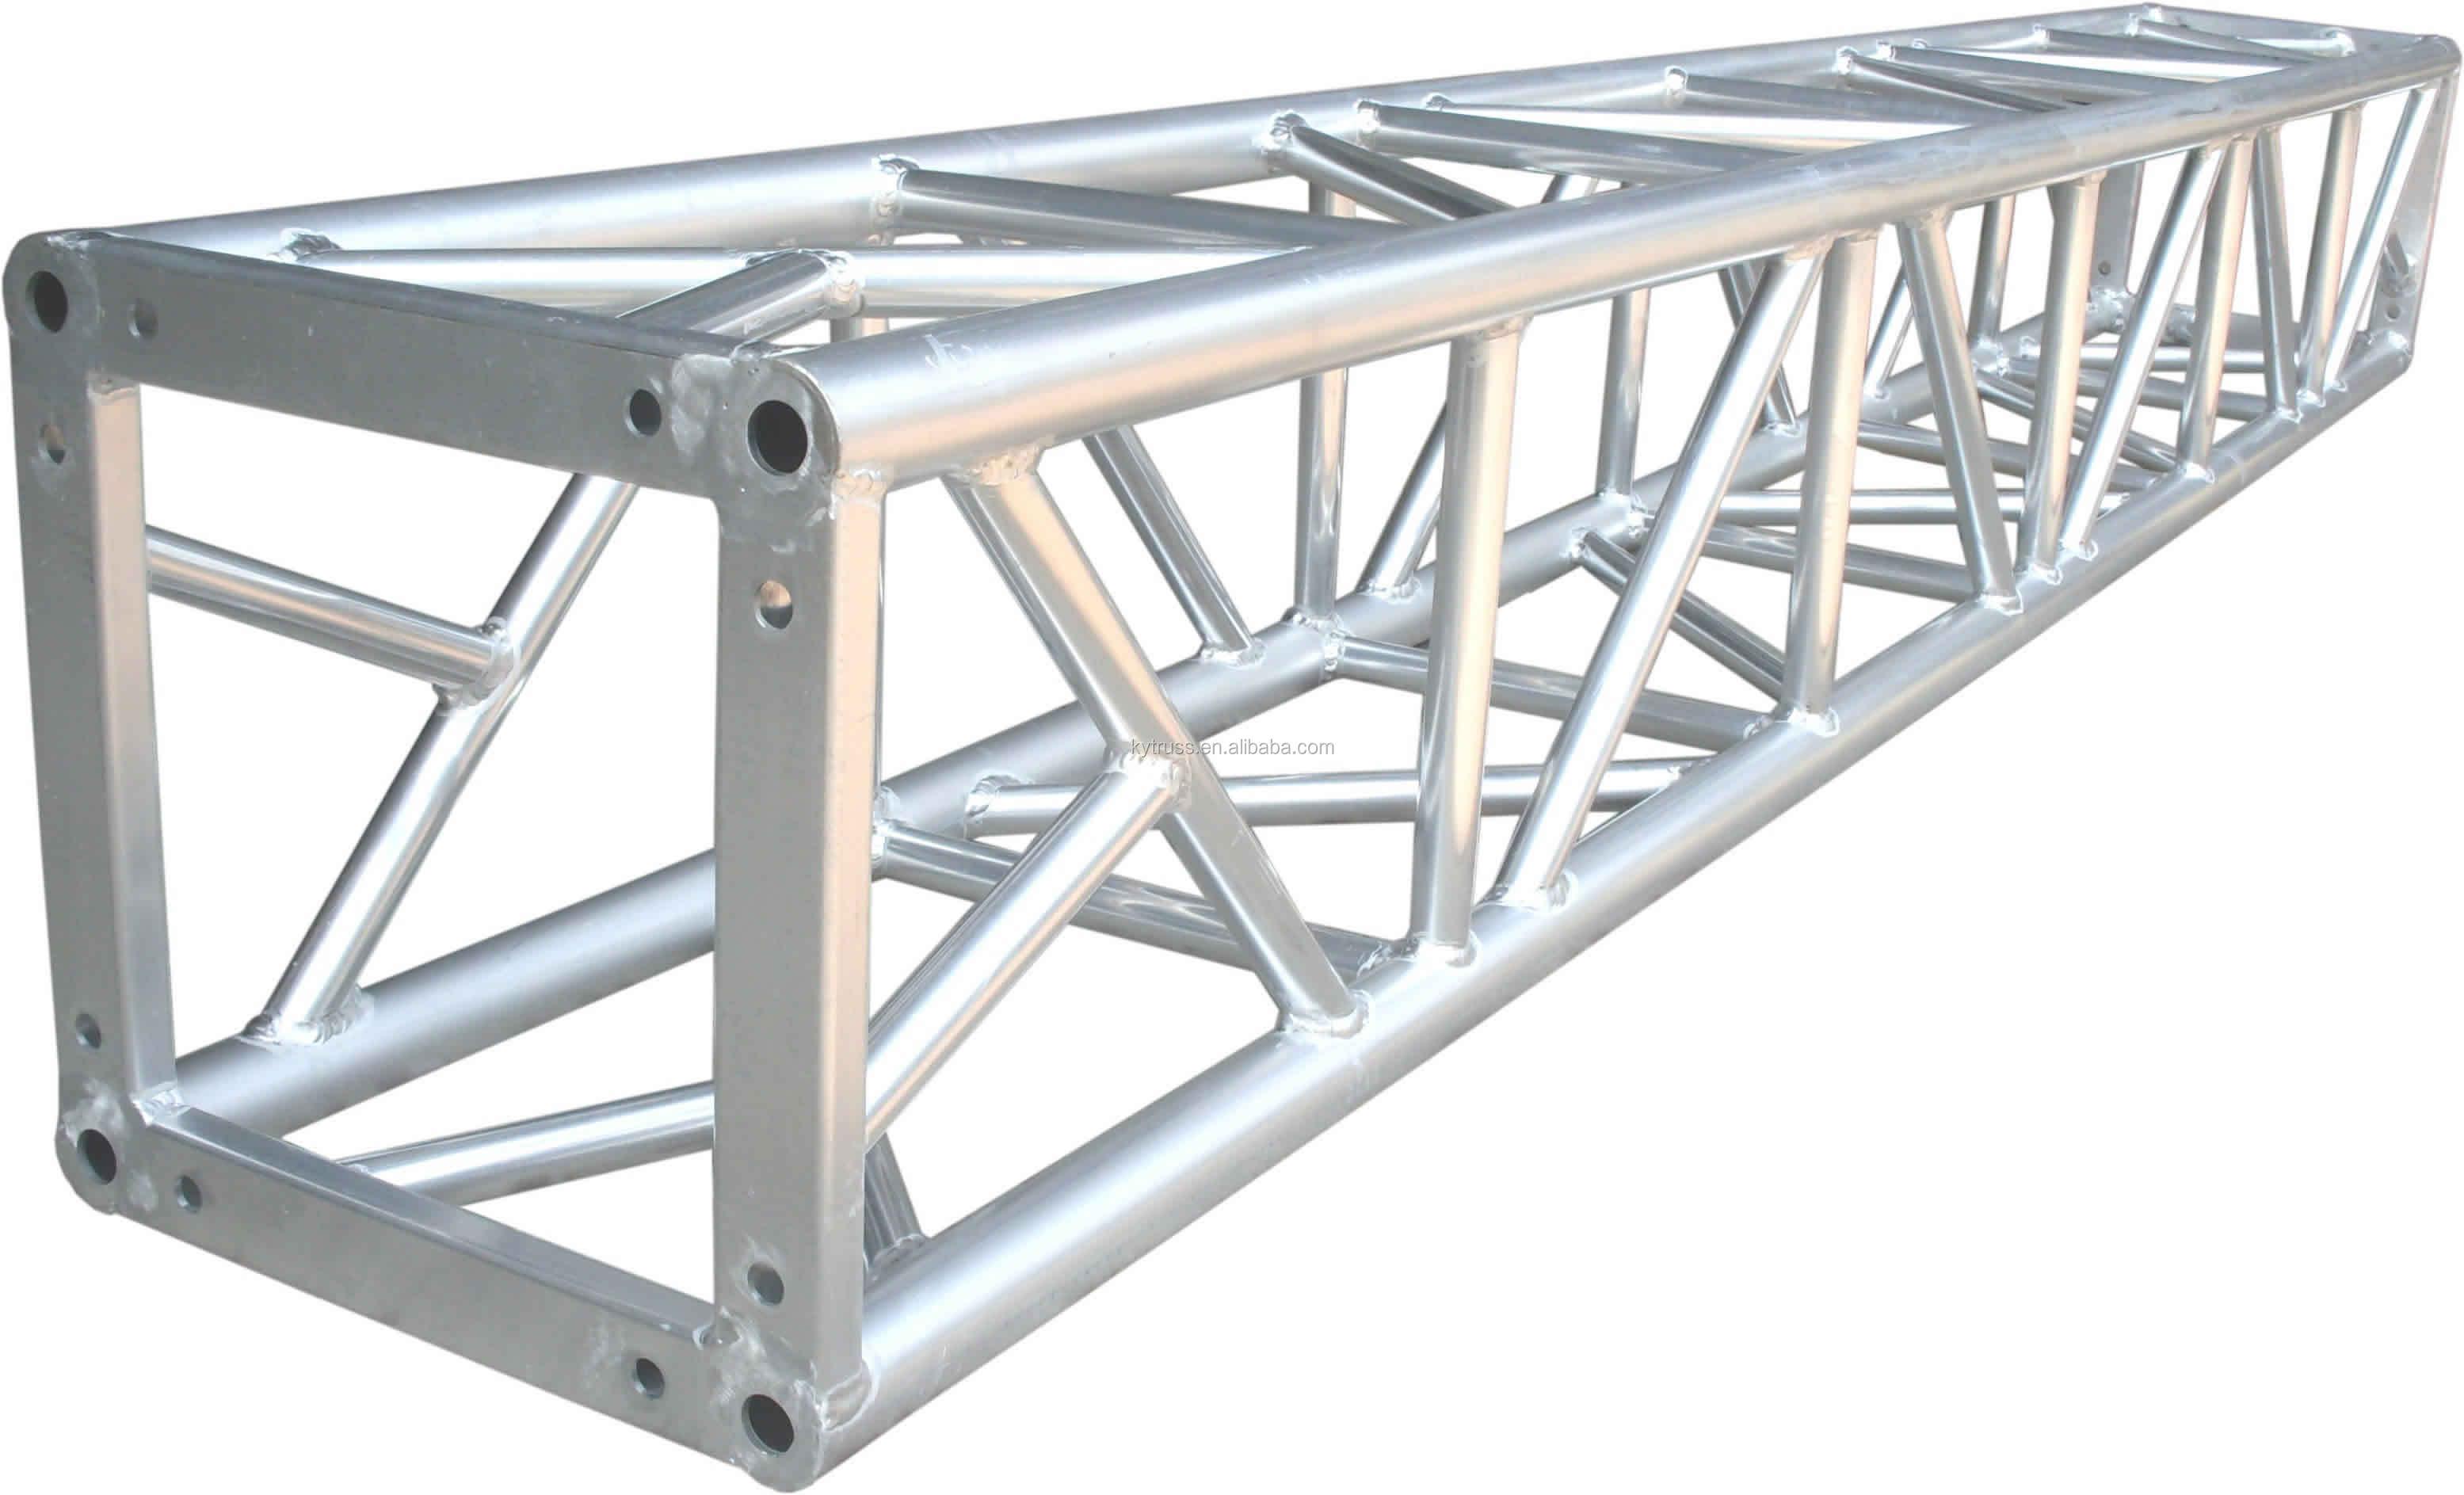 Aluminum truss stage lighting truss lift truss system for Buy truss